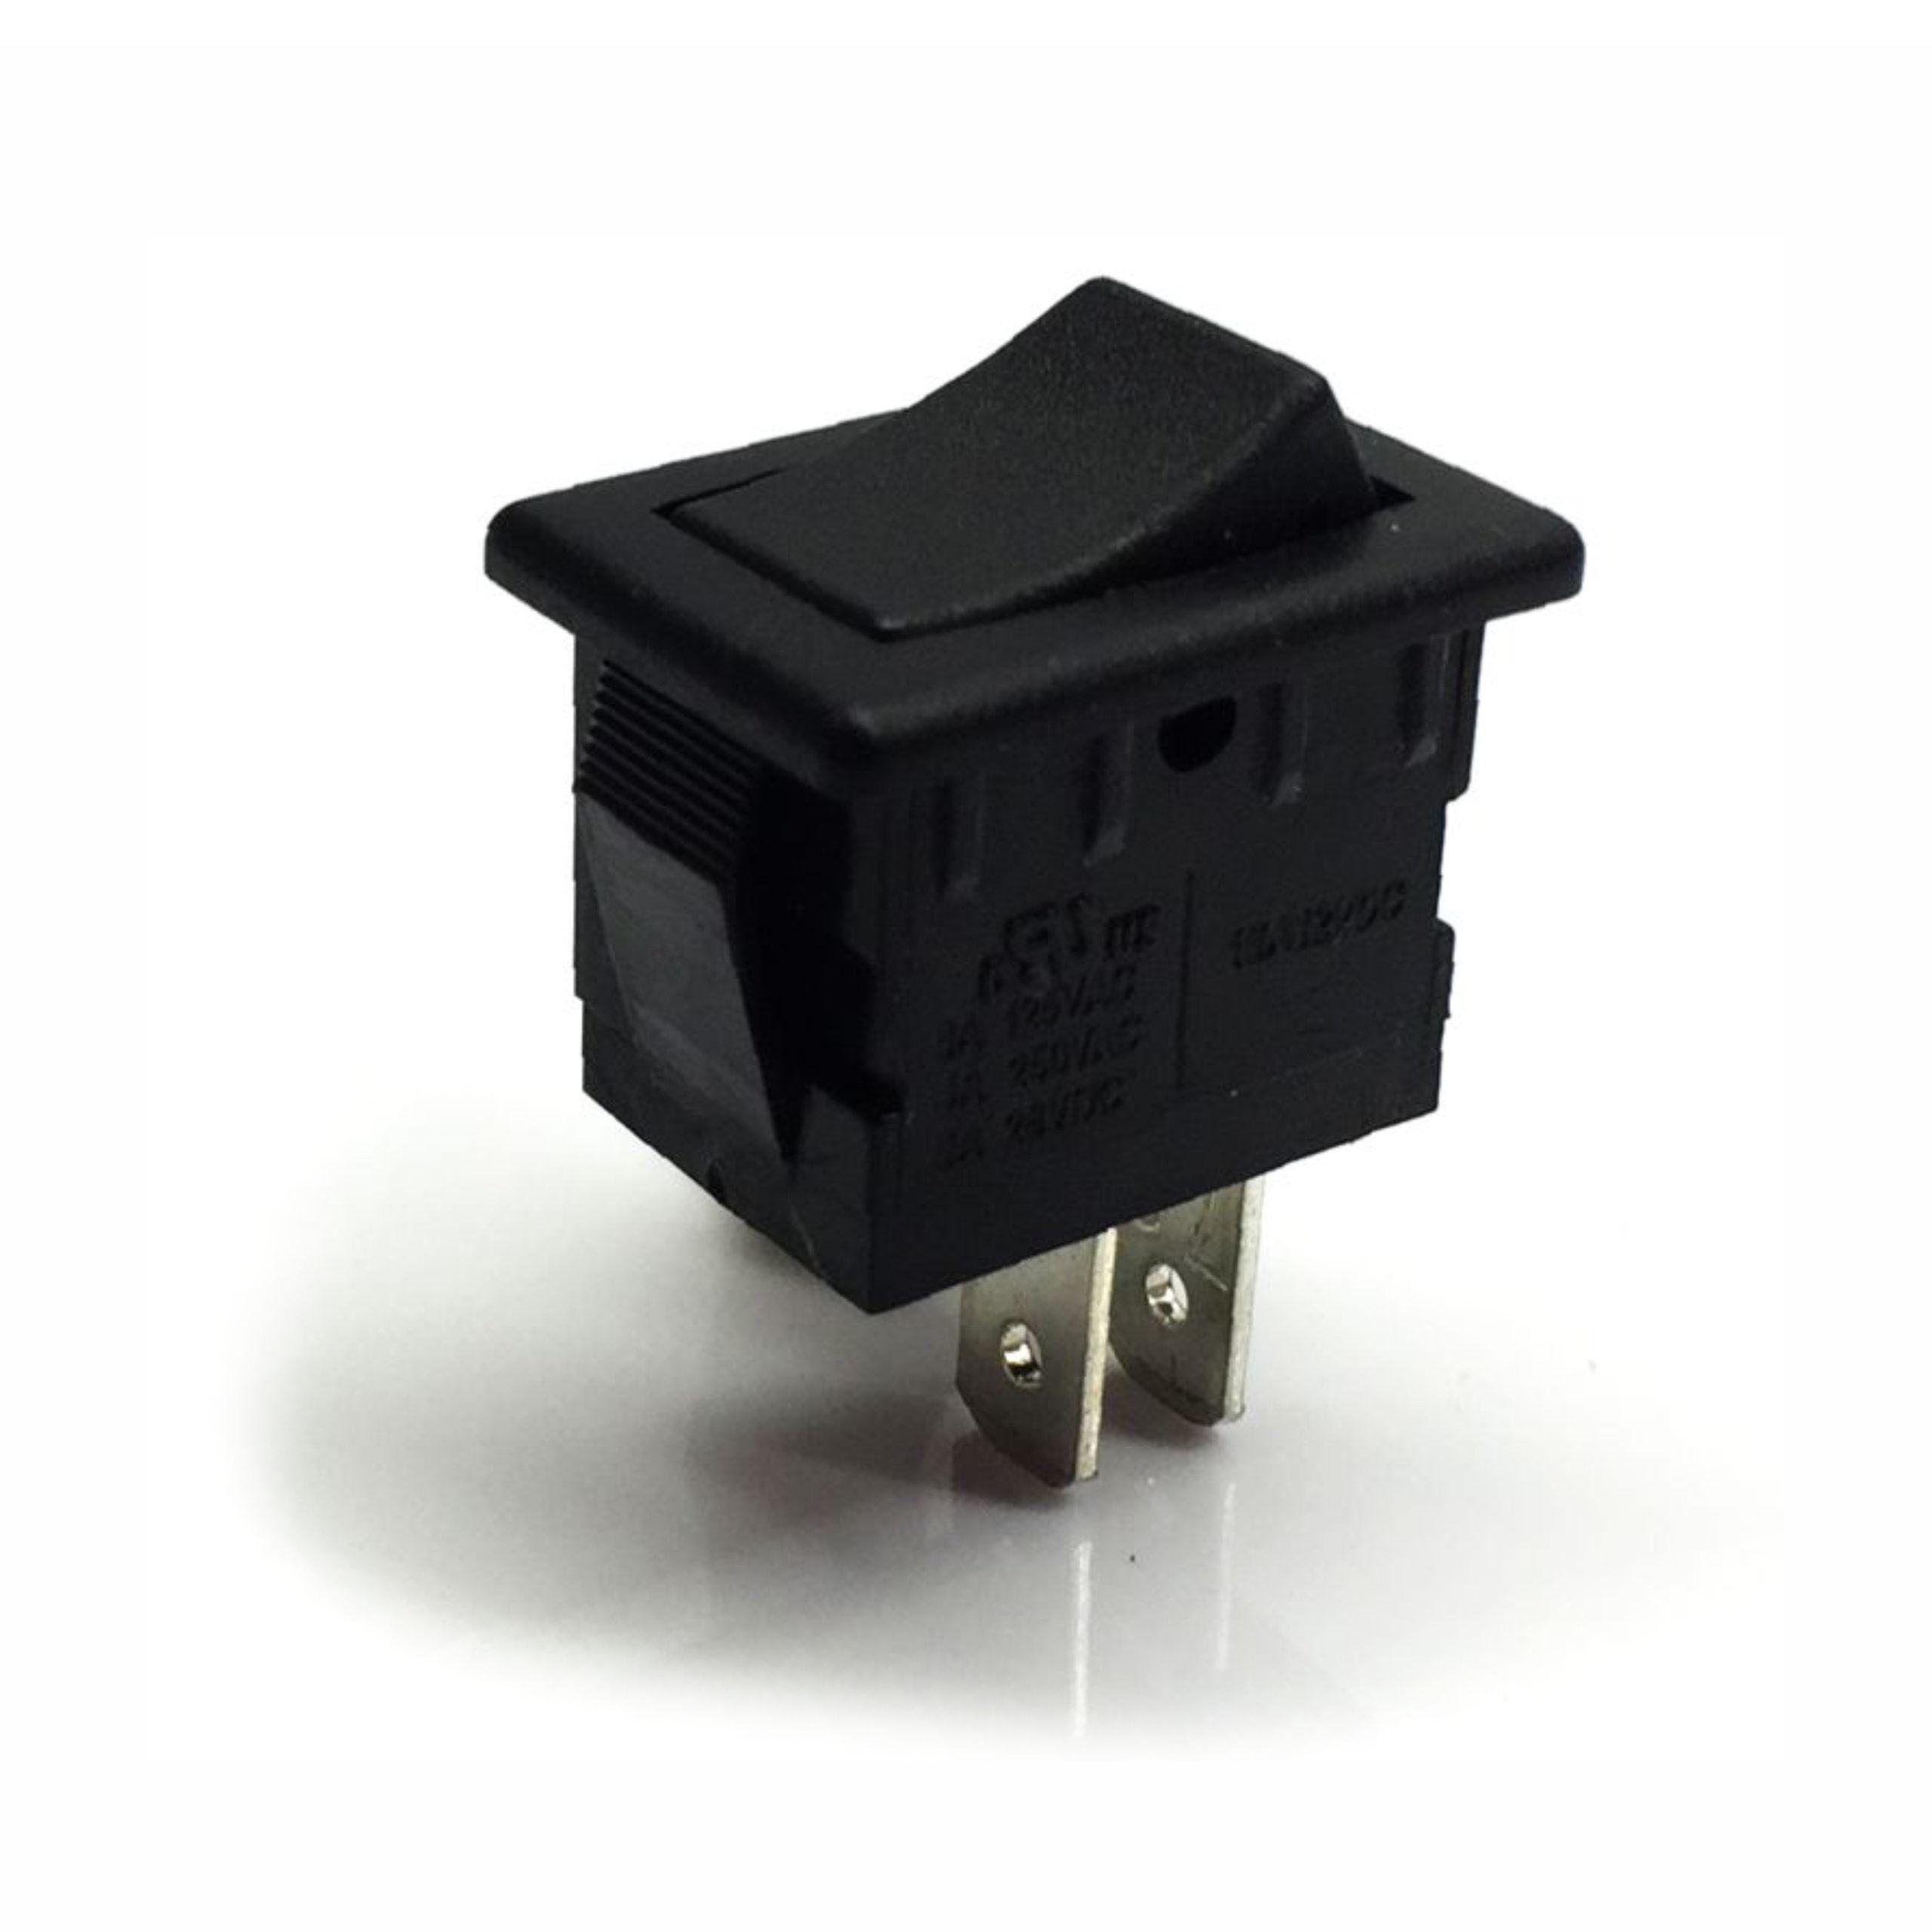 001 Bb Gama Electronics Spst 125vac Switch Wiring Diagram